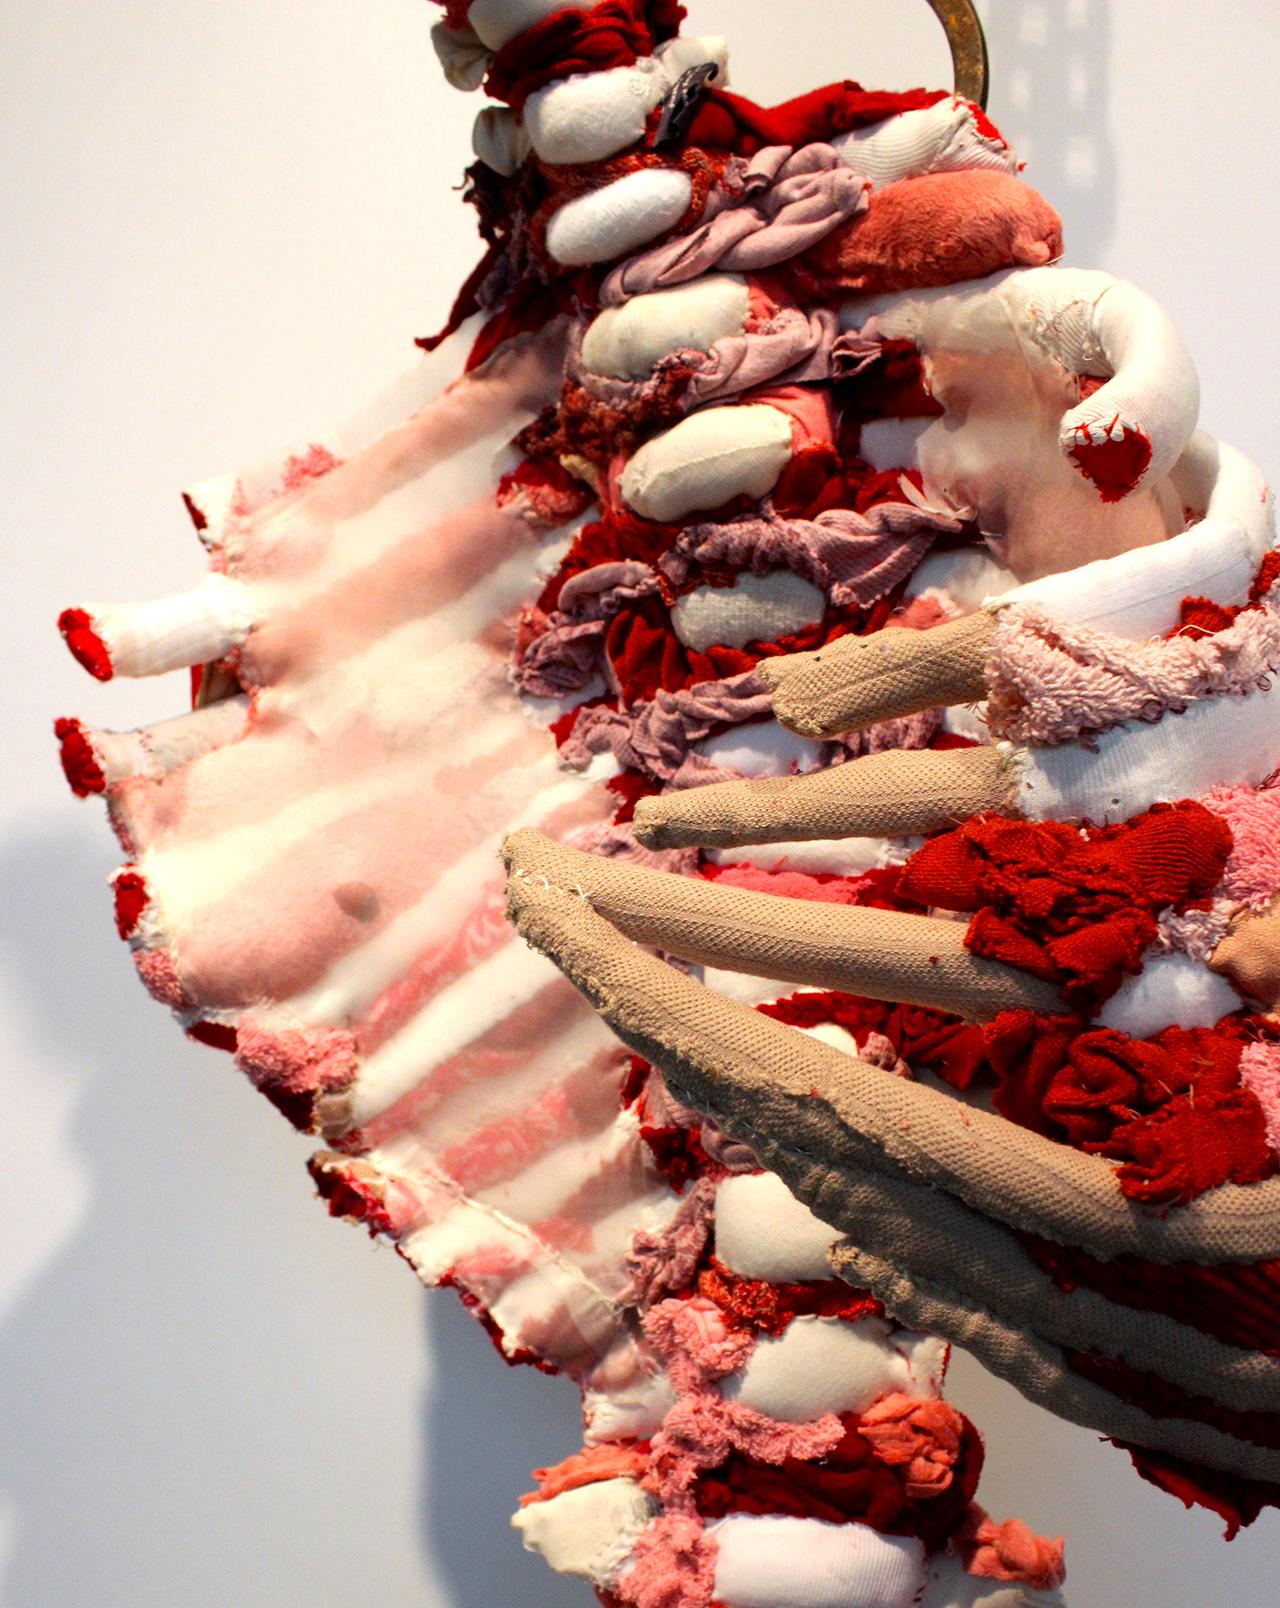 Detail of Tamara Kostianovsky's 'Relic' at the UICA